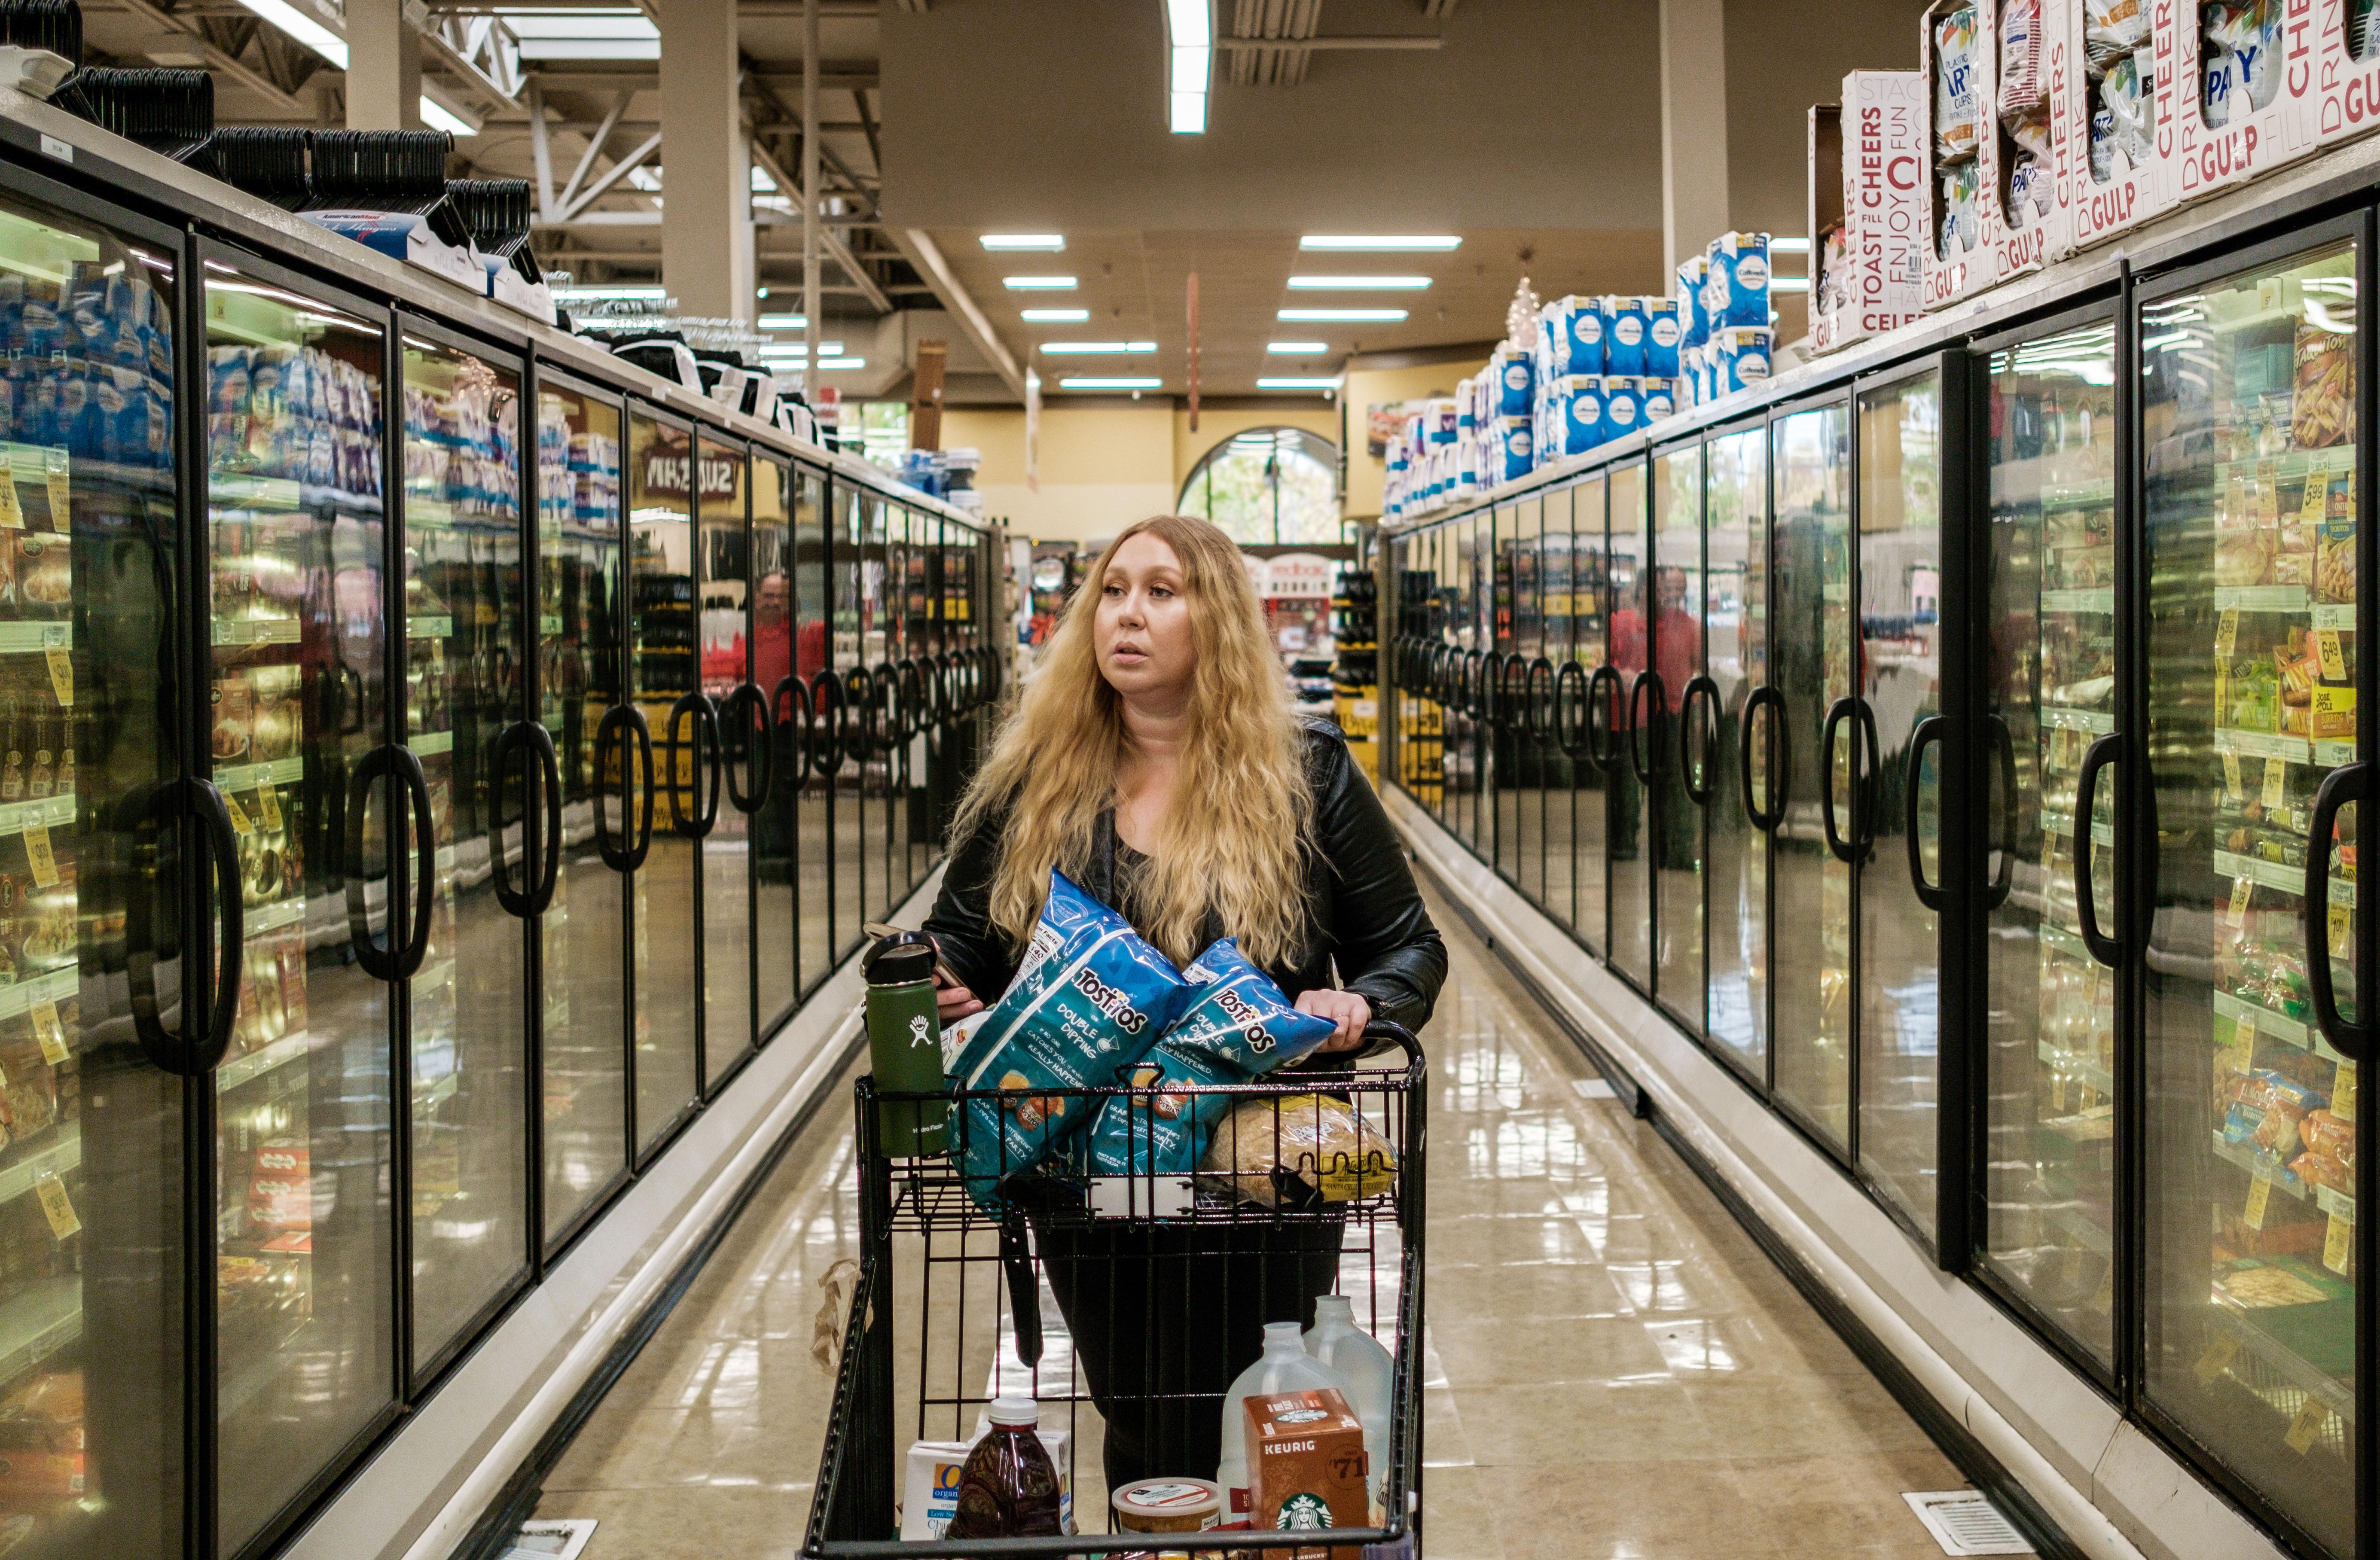 Vanessa Bain-Instacart Shopper